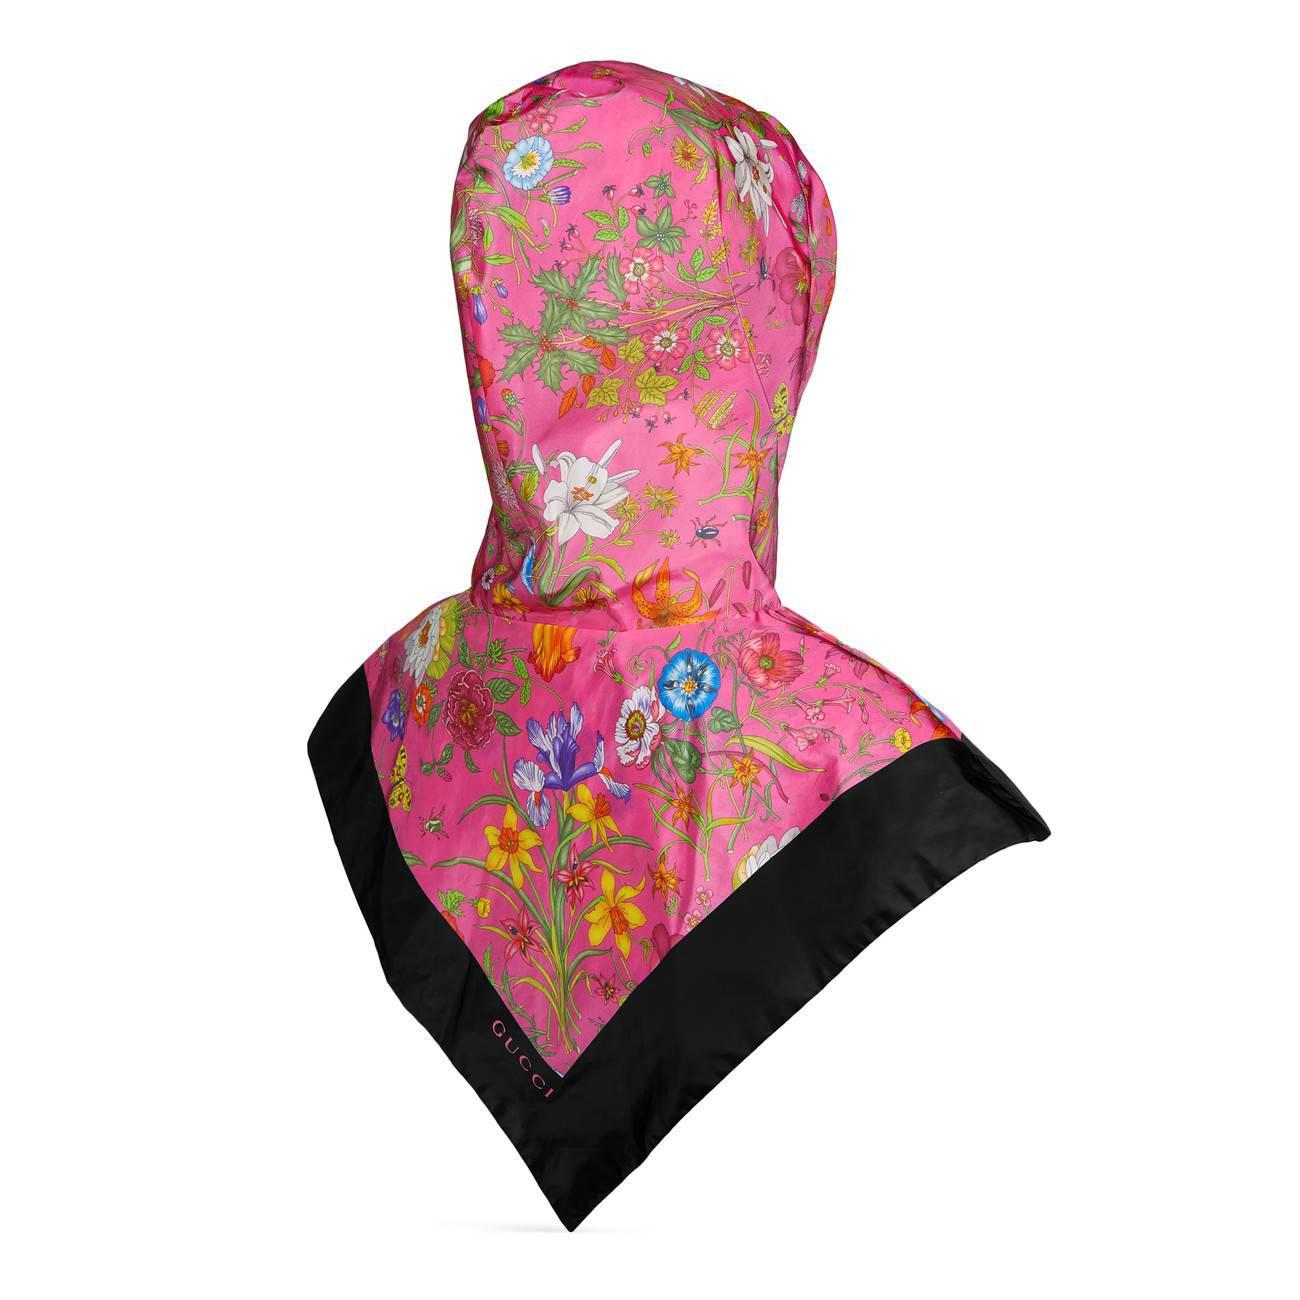 8373cc9261d4 Gucci - Black Nylon Hood With Flora Print - Lyst. View fullscreen